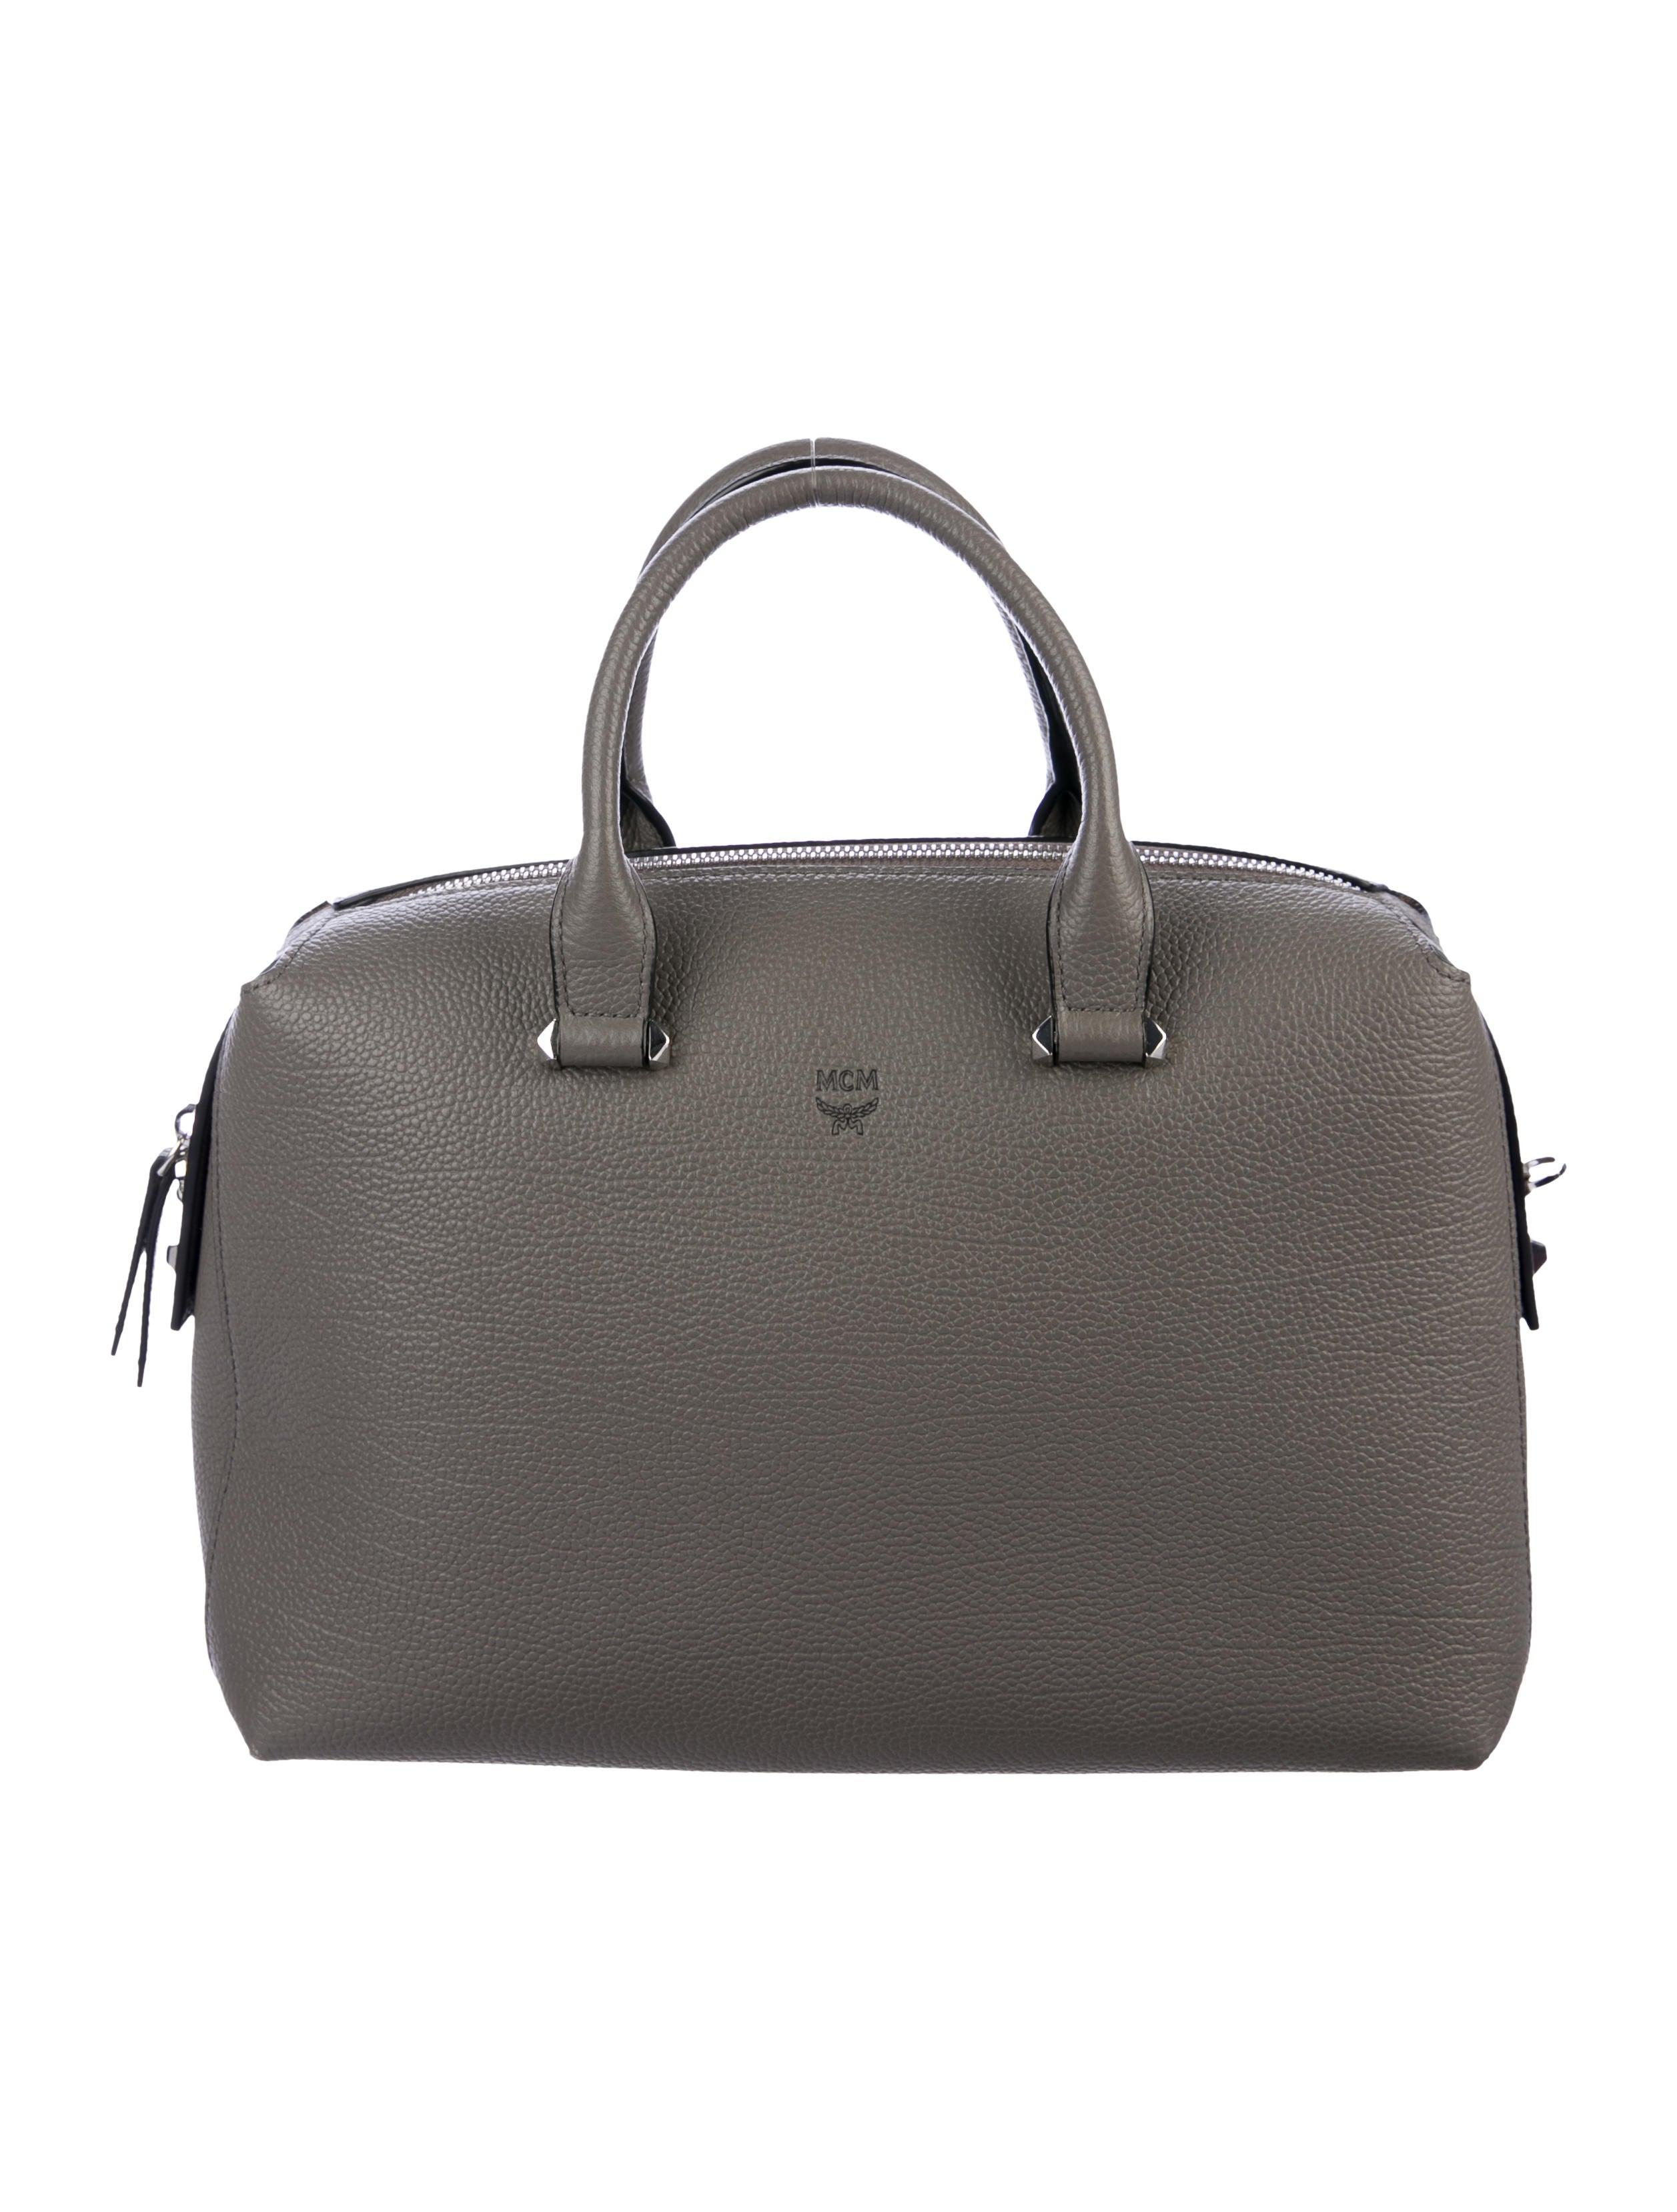 56928dd5ddc28e MCM Medium Ella Boston Bowler Bag - Handbags - W3023054